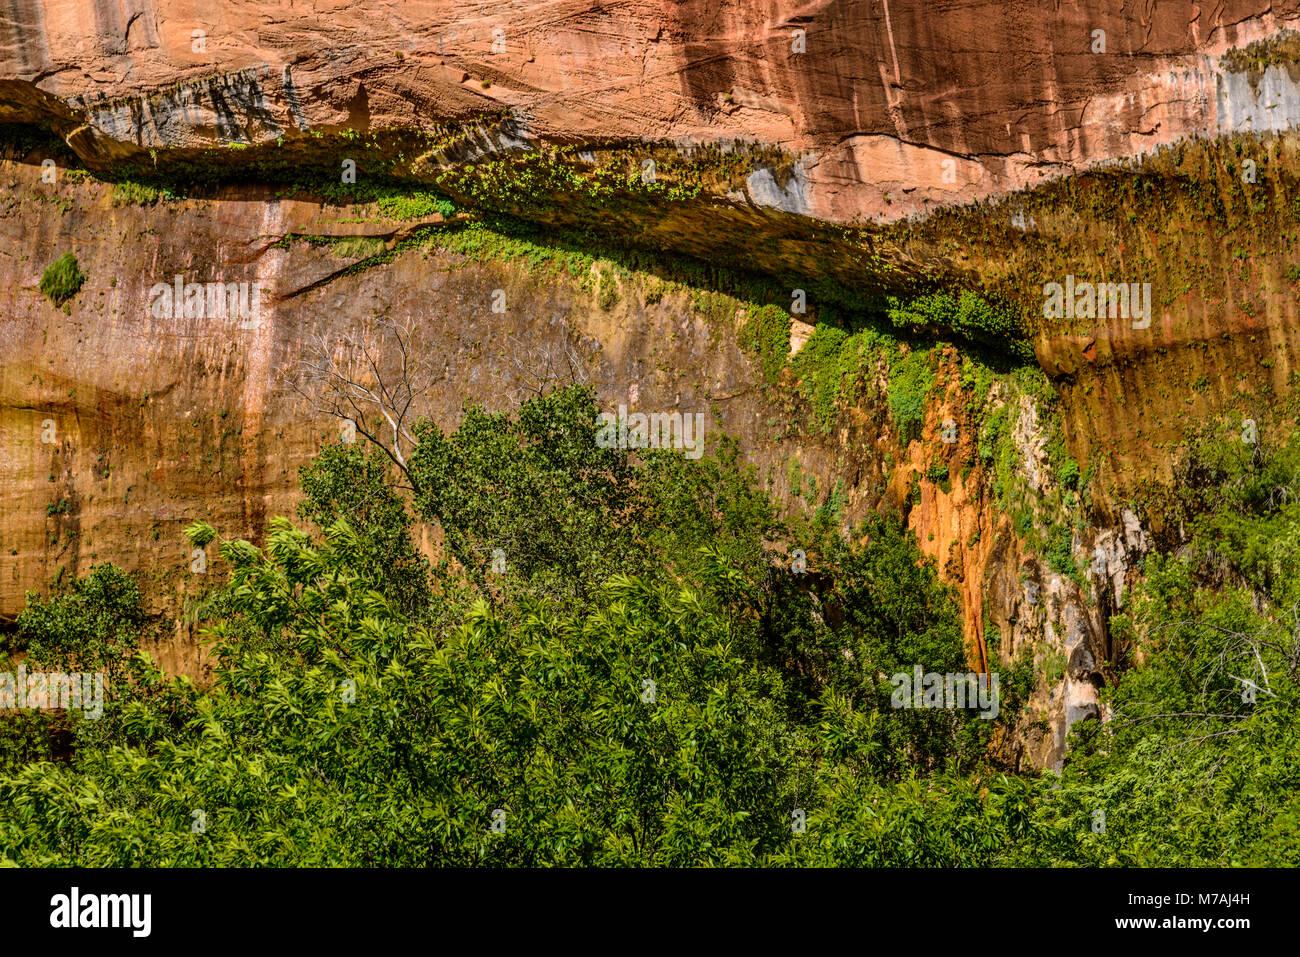 The USA, Utah, Washington county, Springdale, Zion National Park, Zion canyon, weeping rock - Stock Image